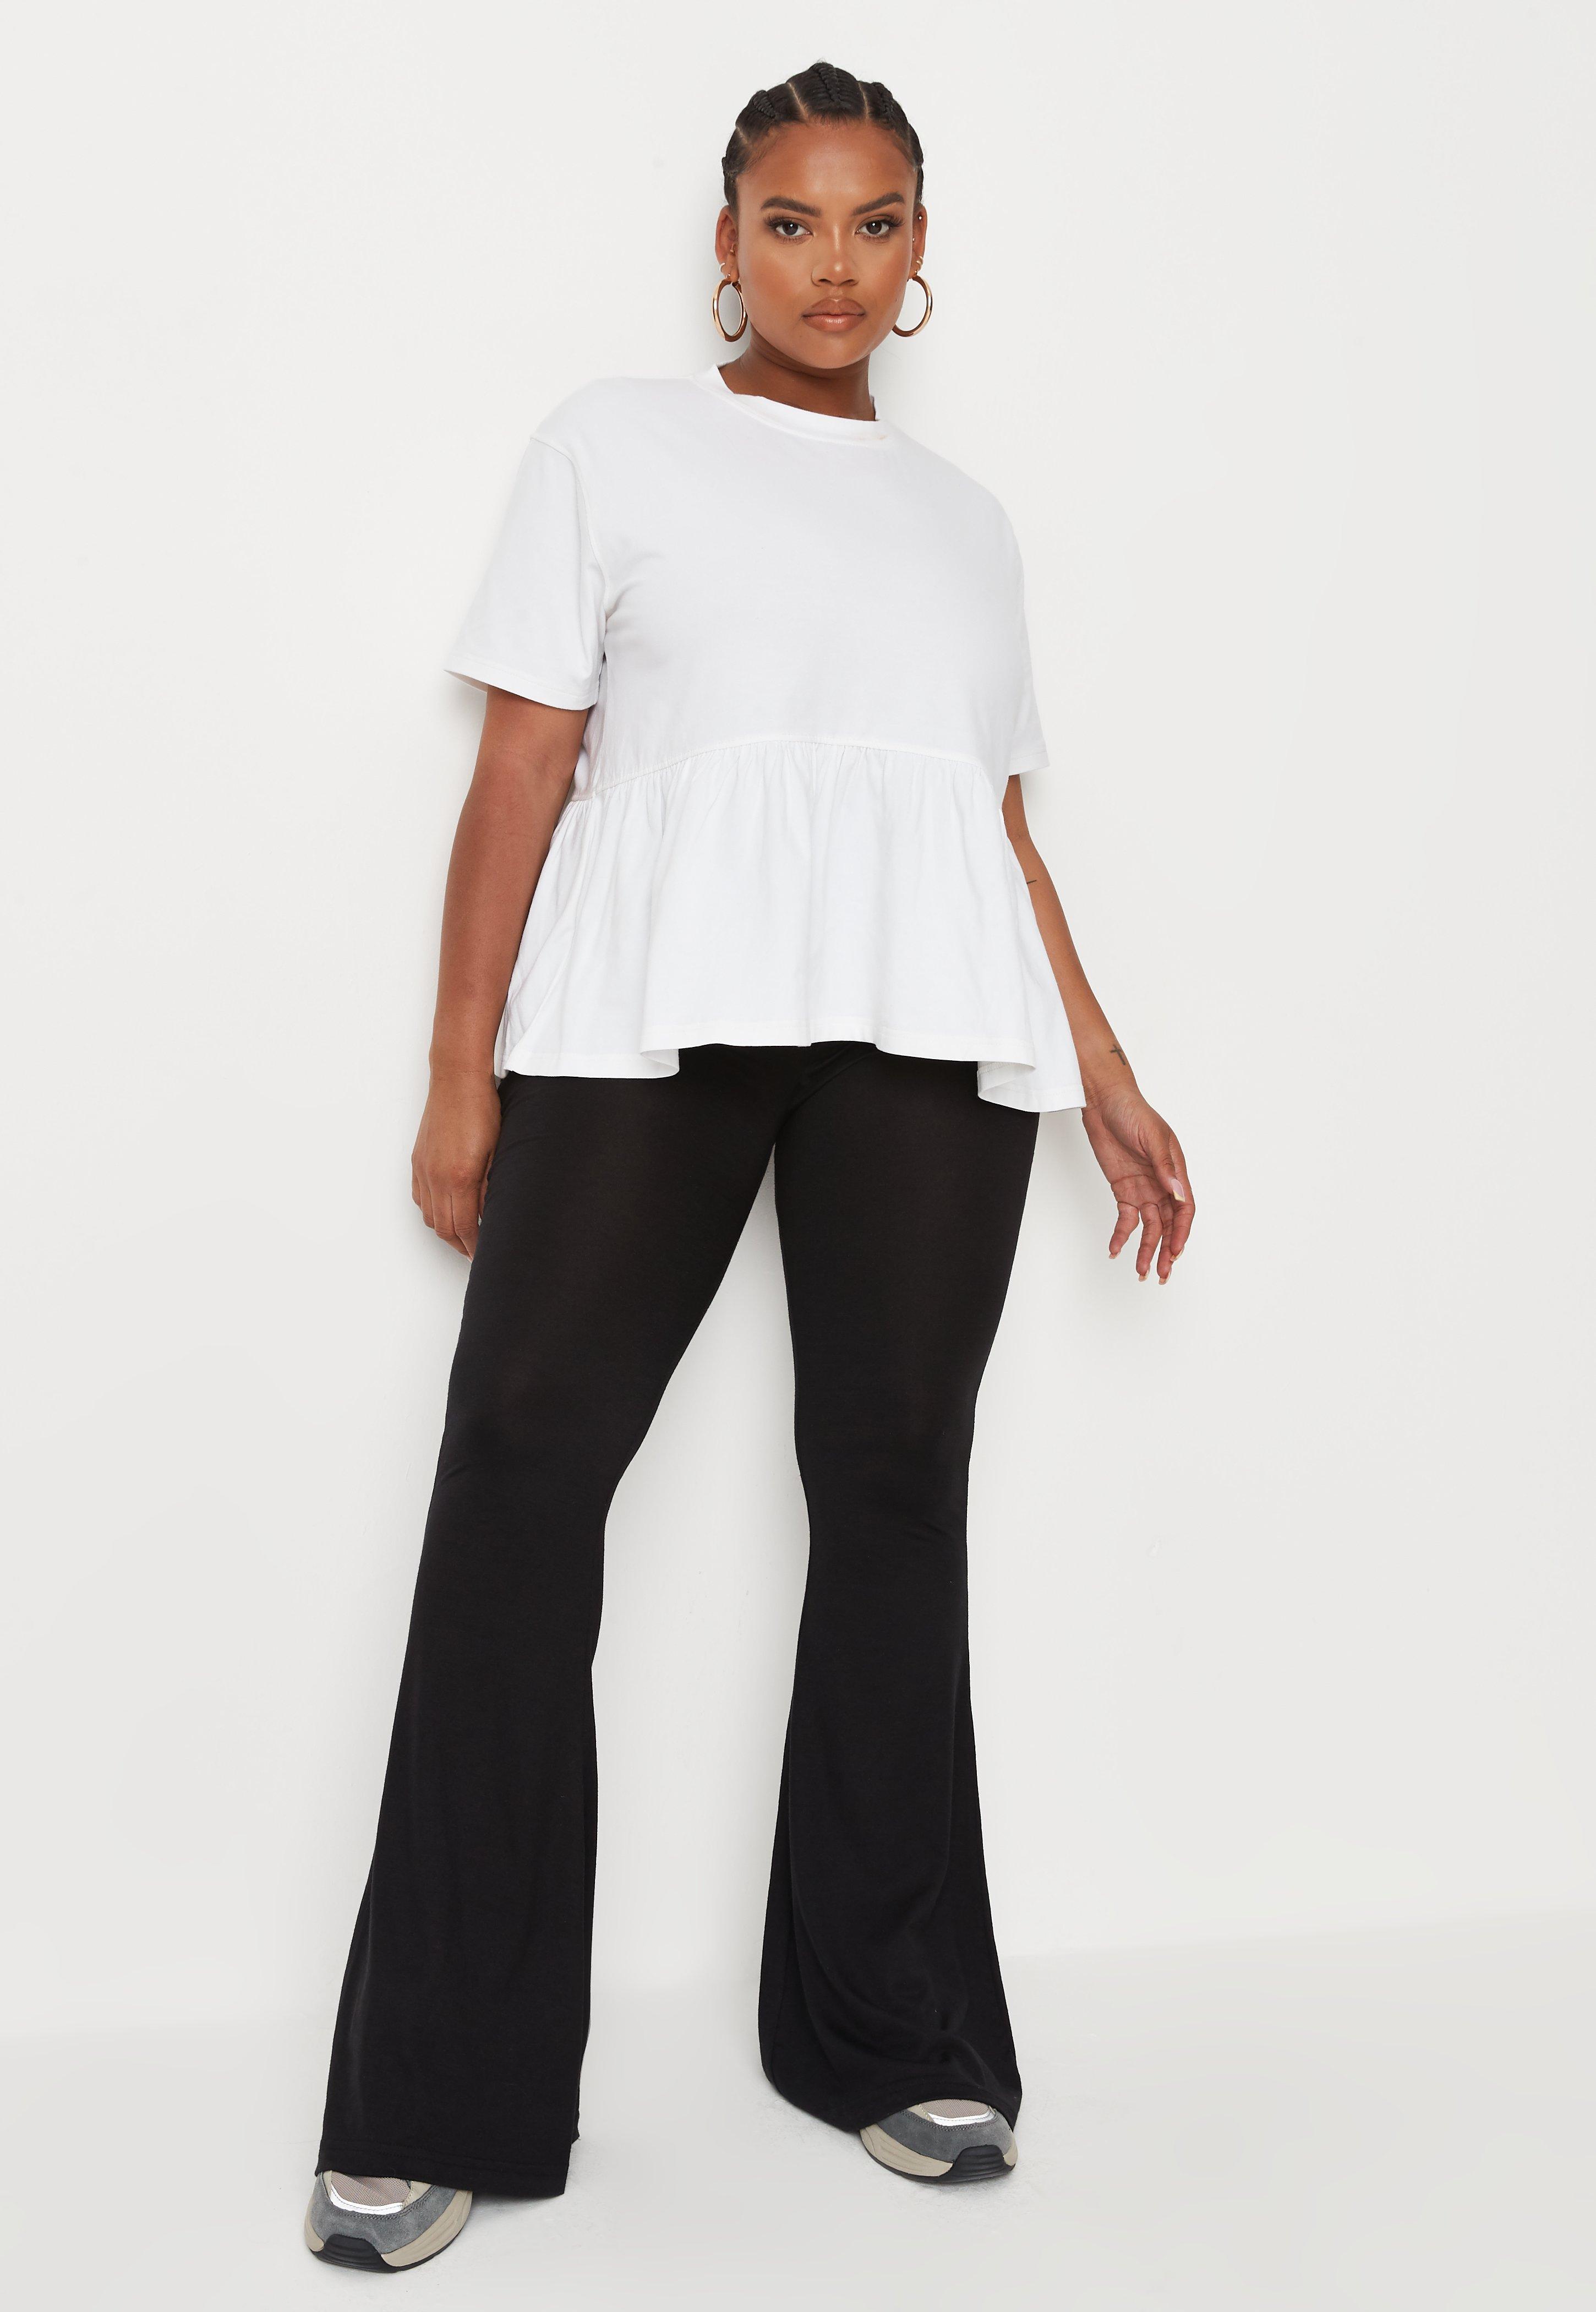 33e929bfc98 Plus Size Clothing   Plus Size Women s Fashion